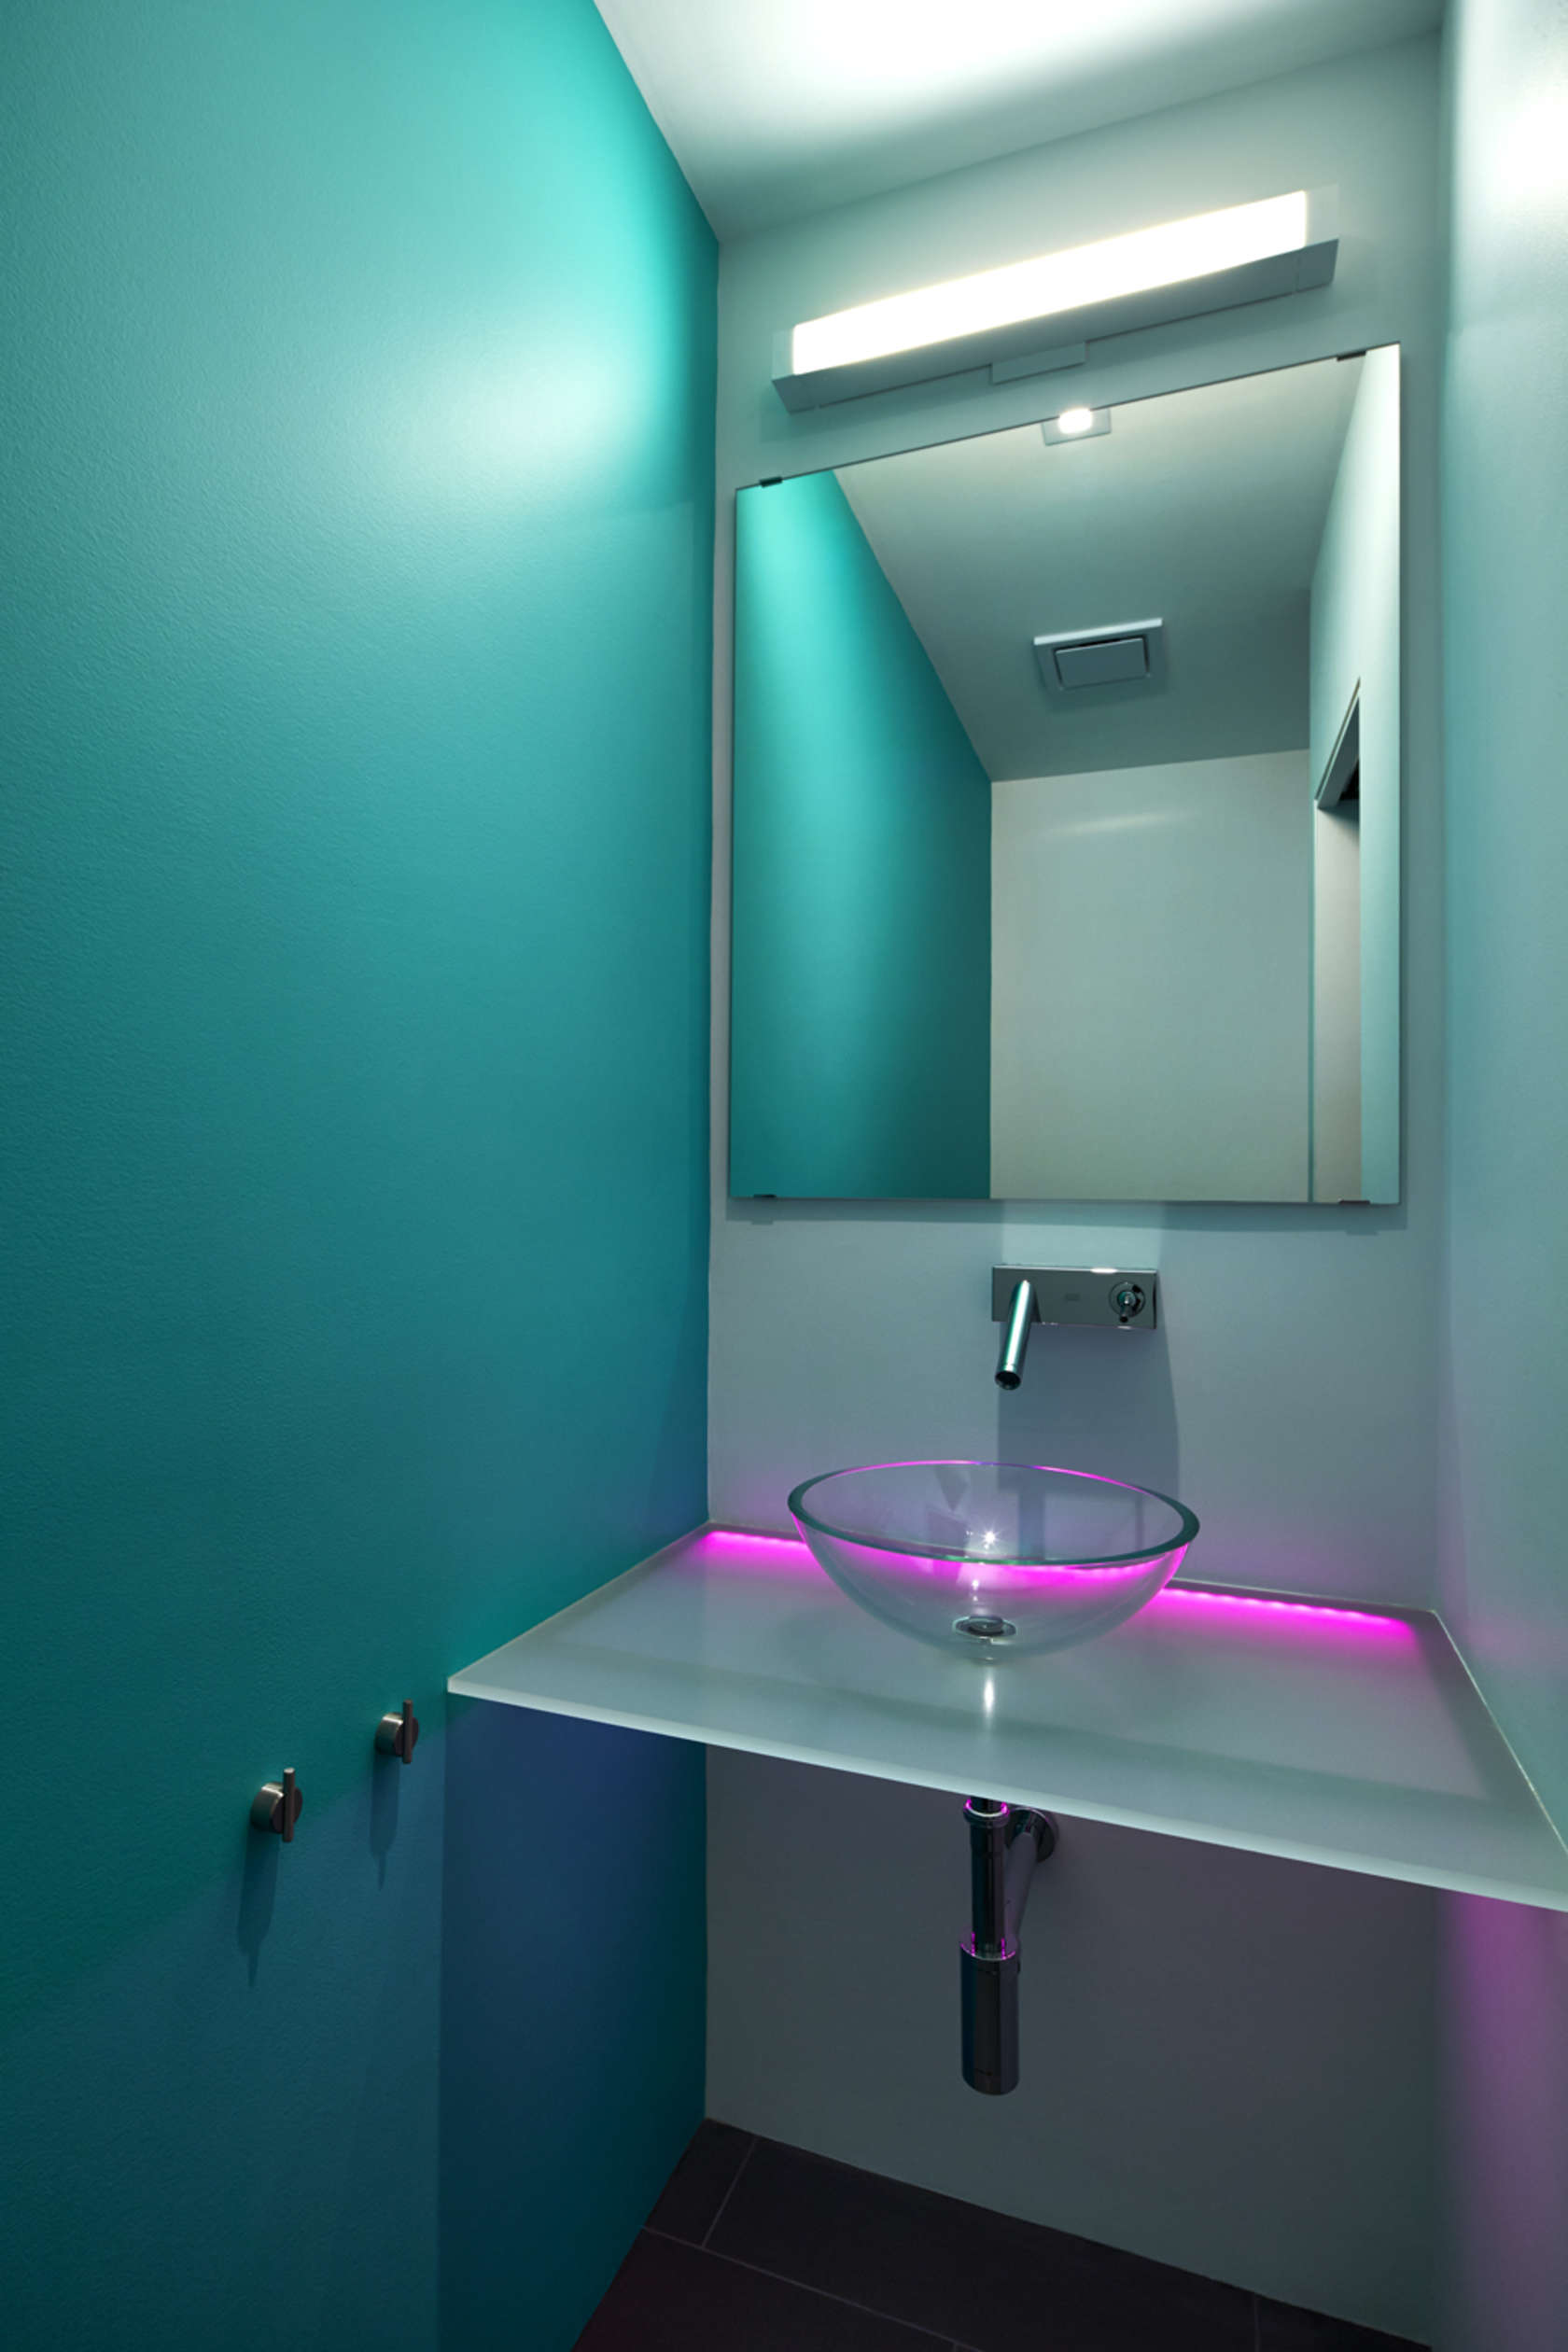 Led Bathroom Lighting like architecture u0026 interior design? follow us.. JCLBDVU